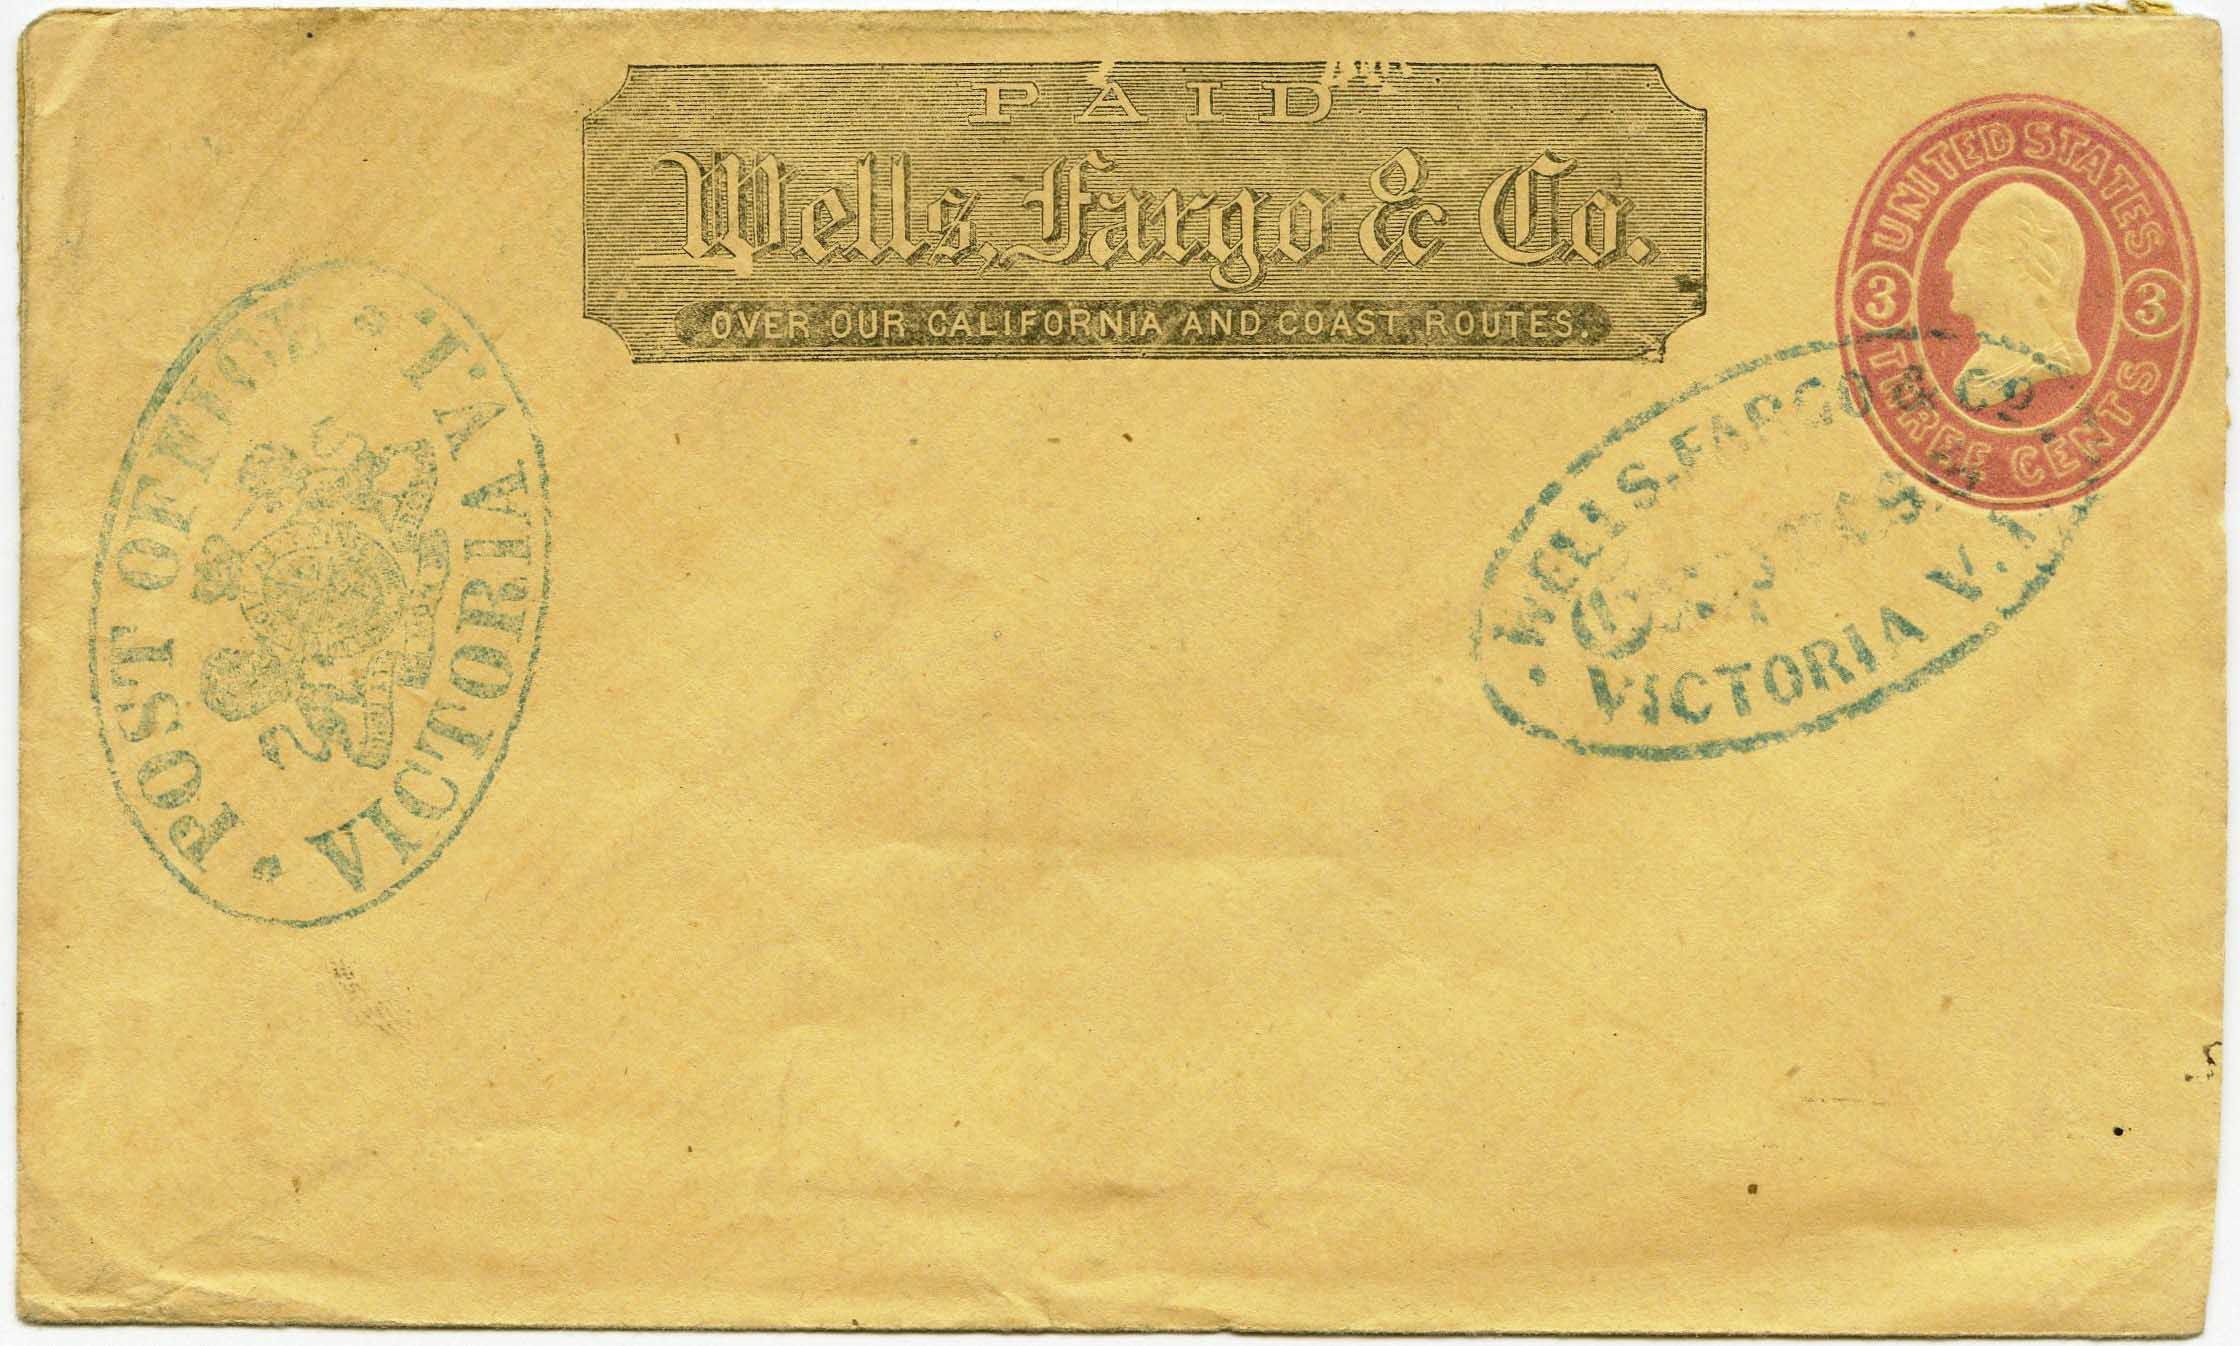 WC13875 VICTORIA, VI 4 3,bl U35